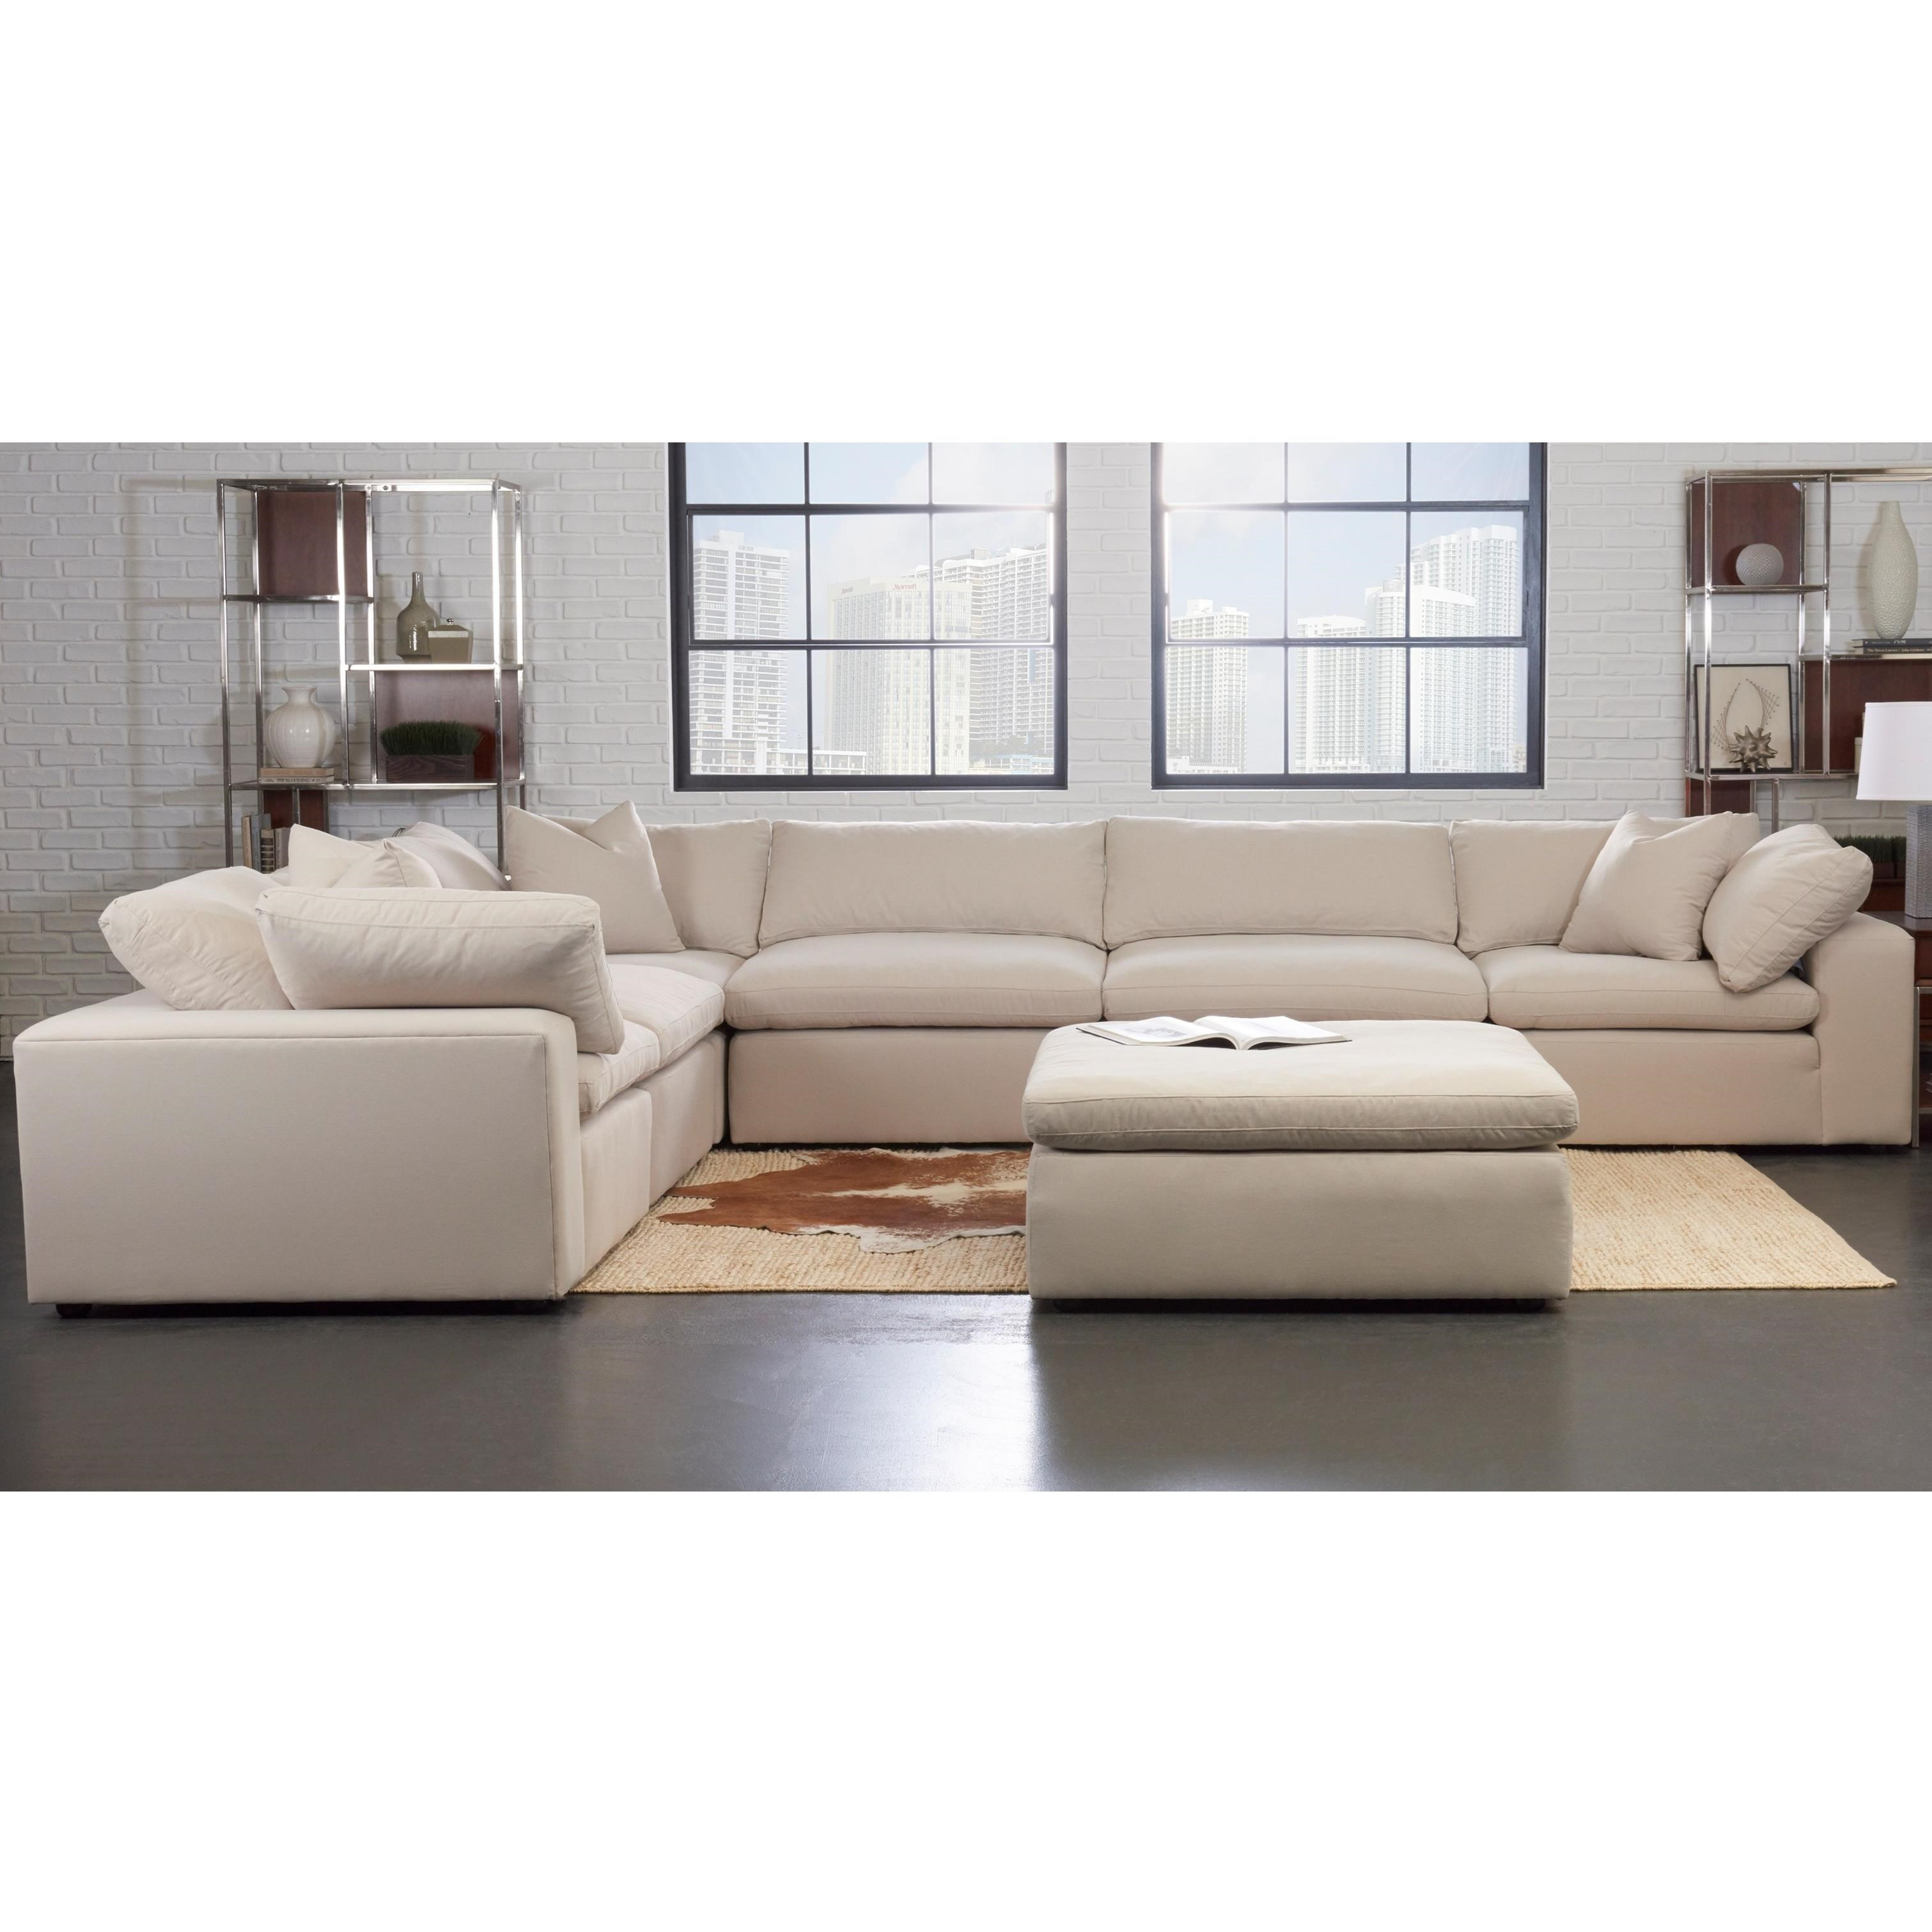 6 piece modular sectional sofa affordable sofas klaussner monterey contemporary pc